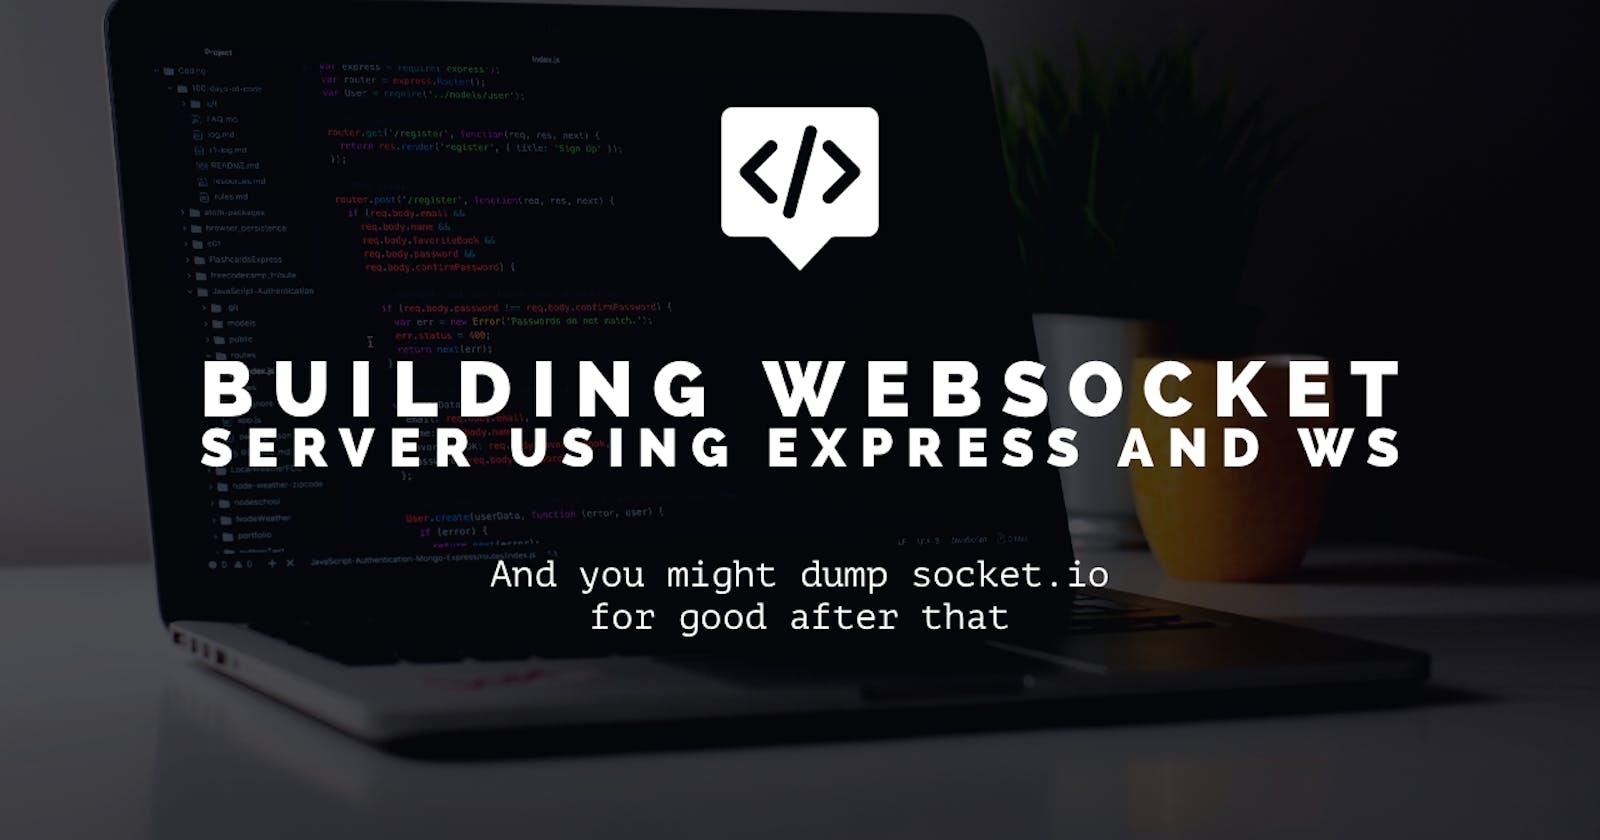 Build a websocket server using express & ws package